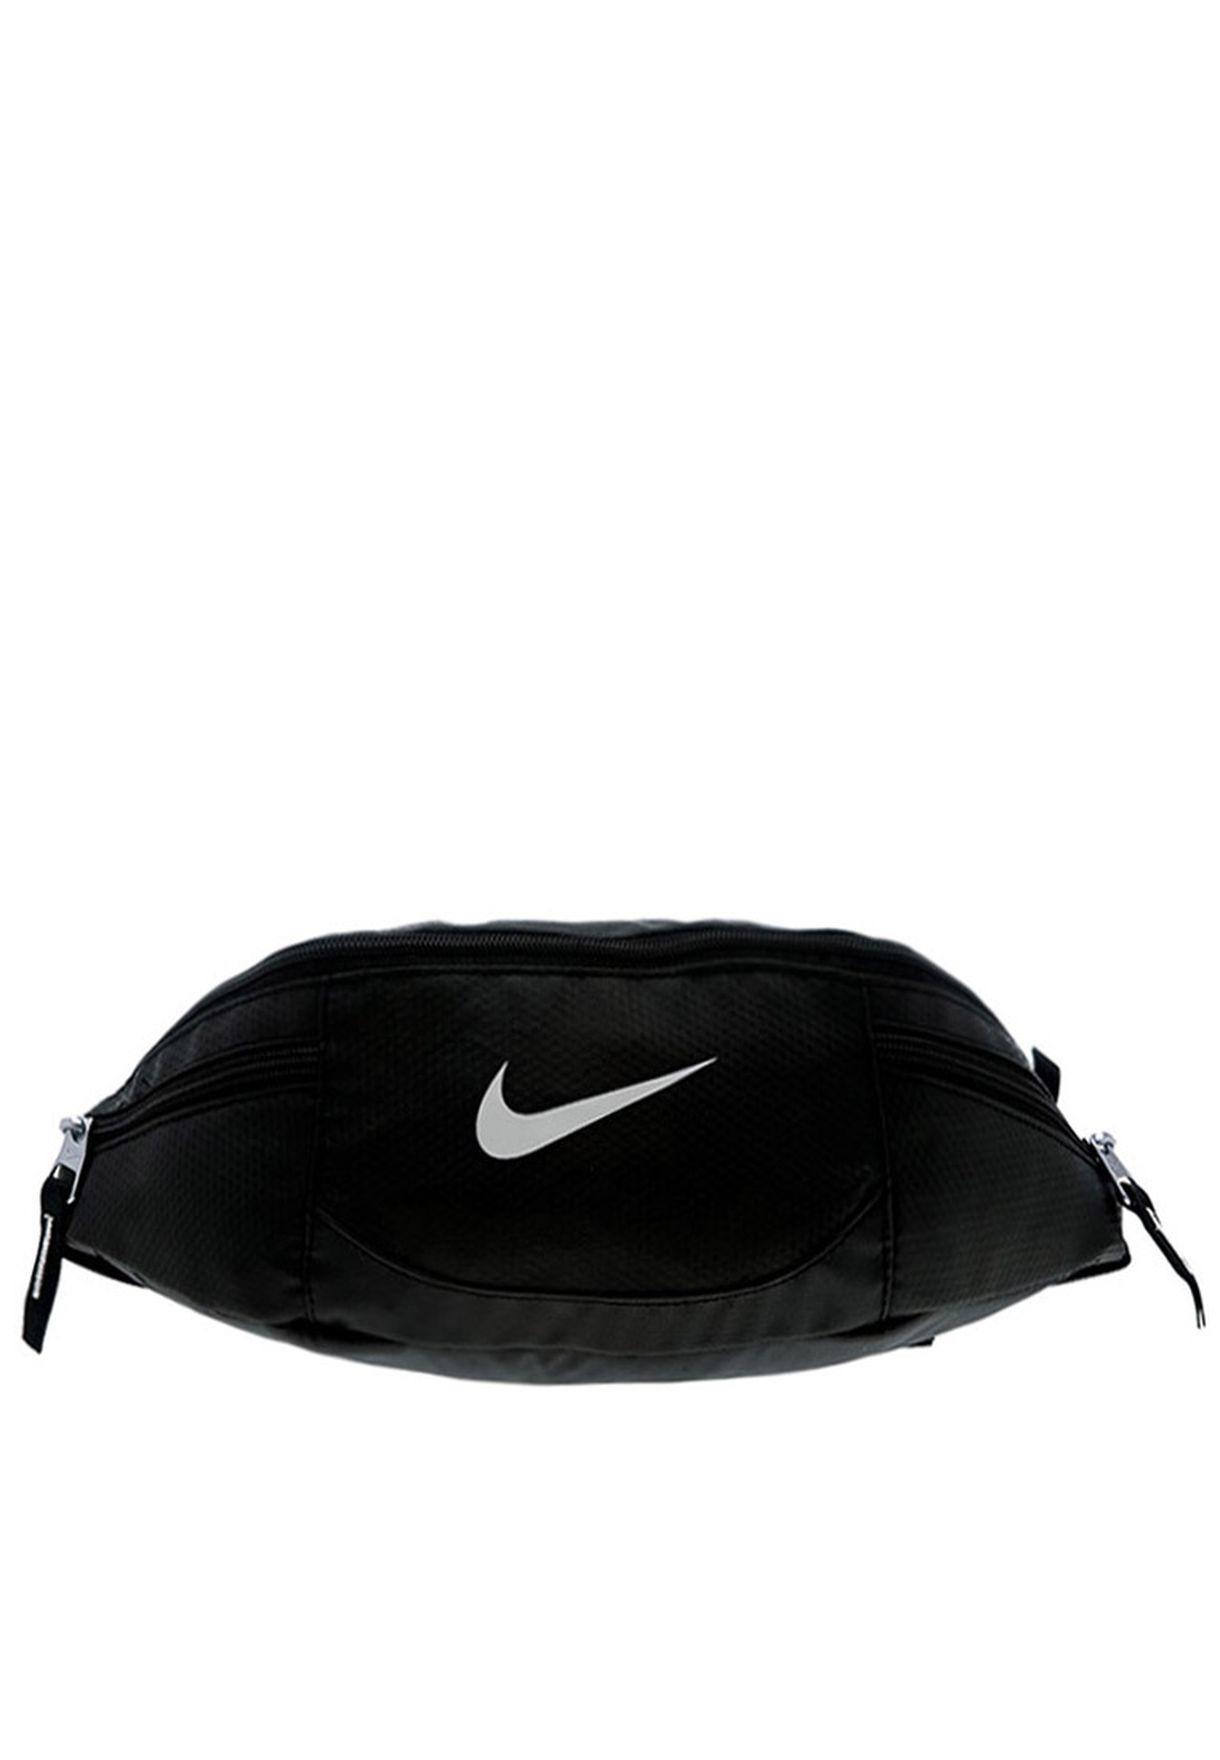 50c72a7107 Shop Nike black Team Training Waistpack BA4601-067 for Men in UAE ...